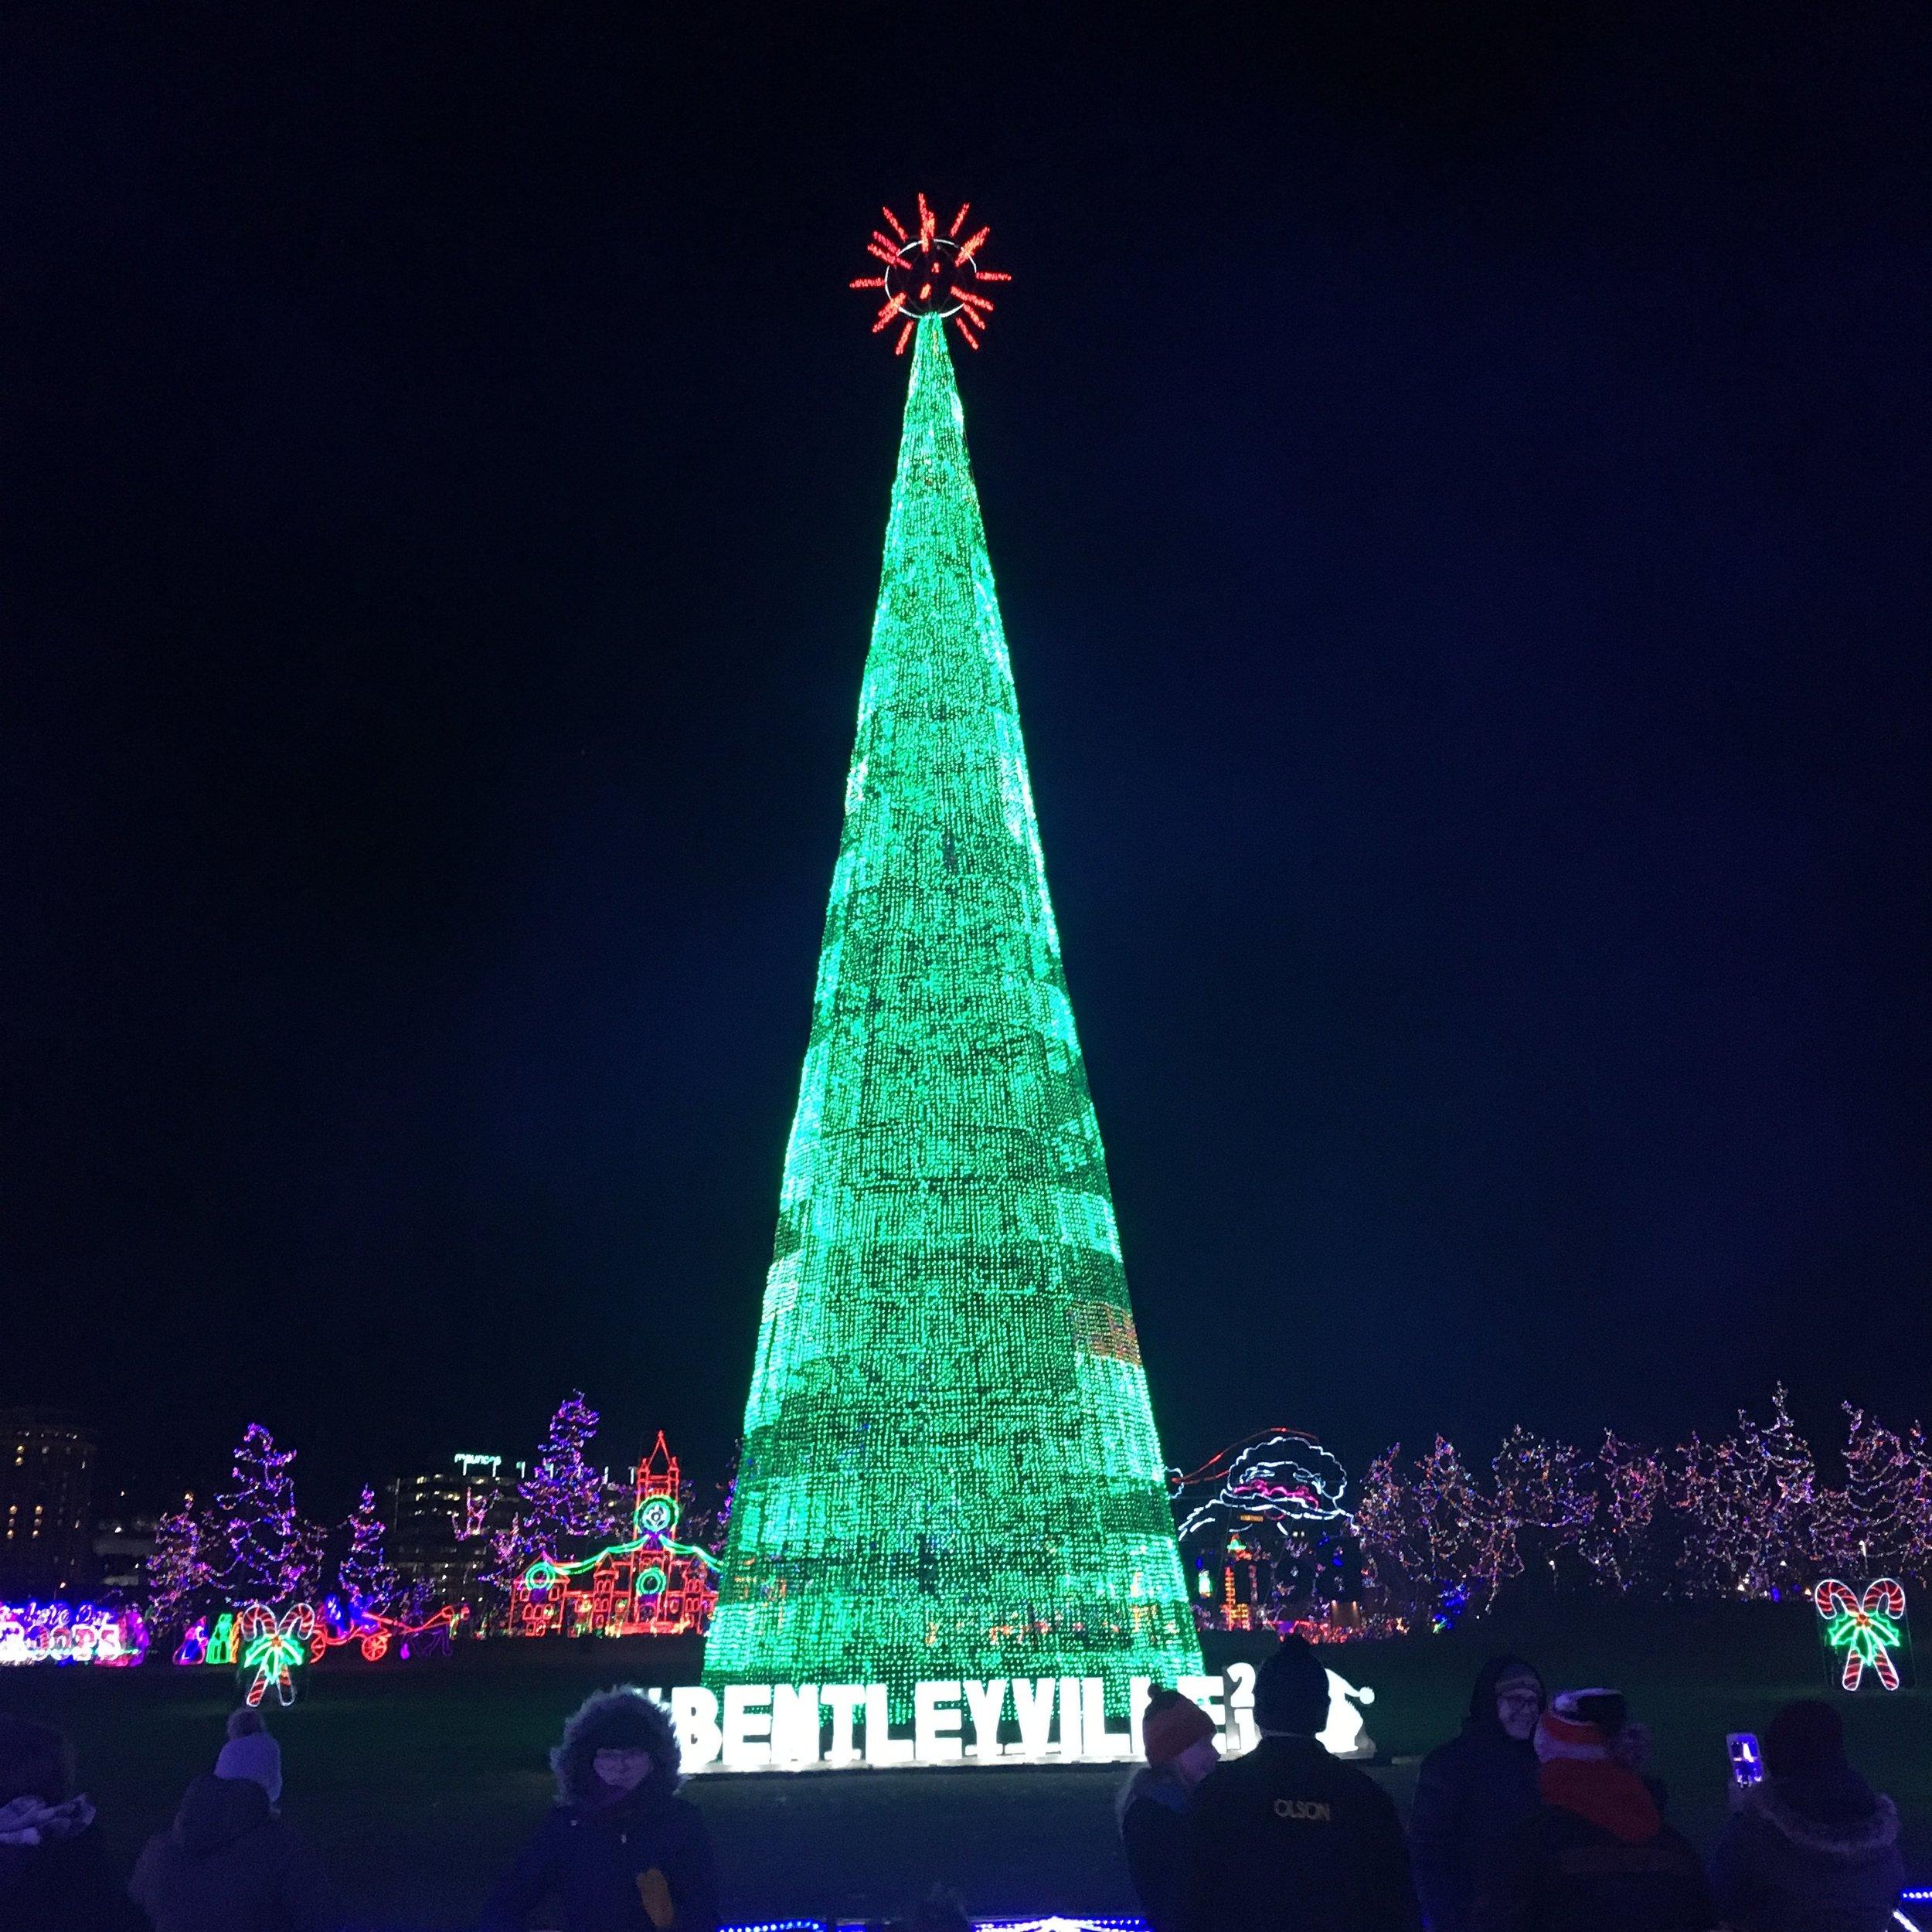 The 2018 Bentleyville tree. Photo courtesy of Rebecca Kottke